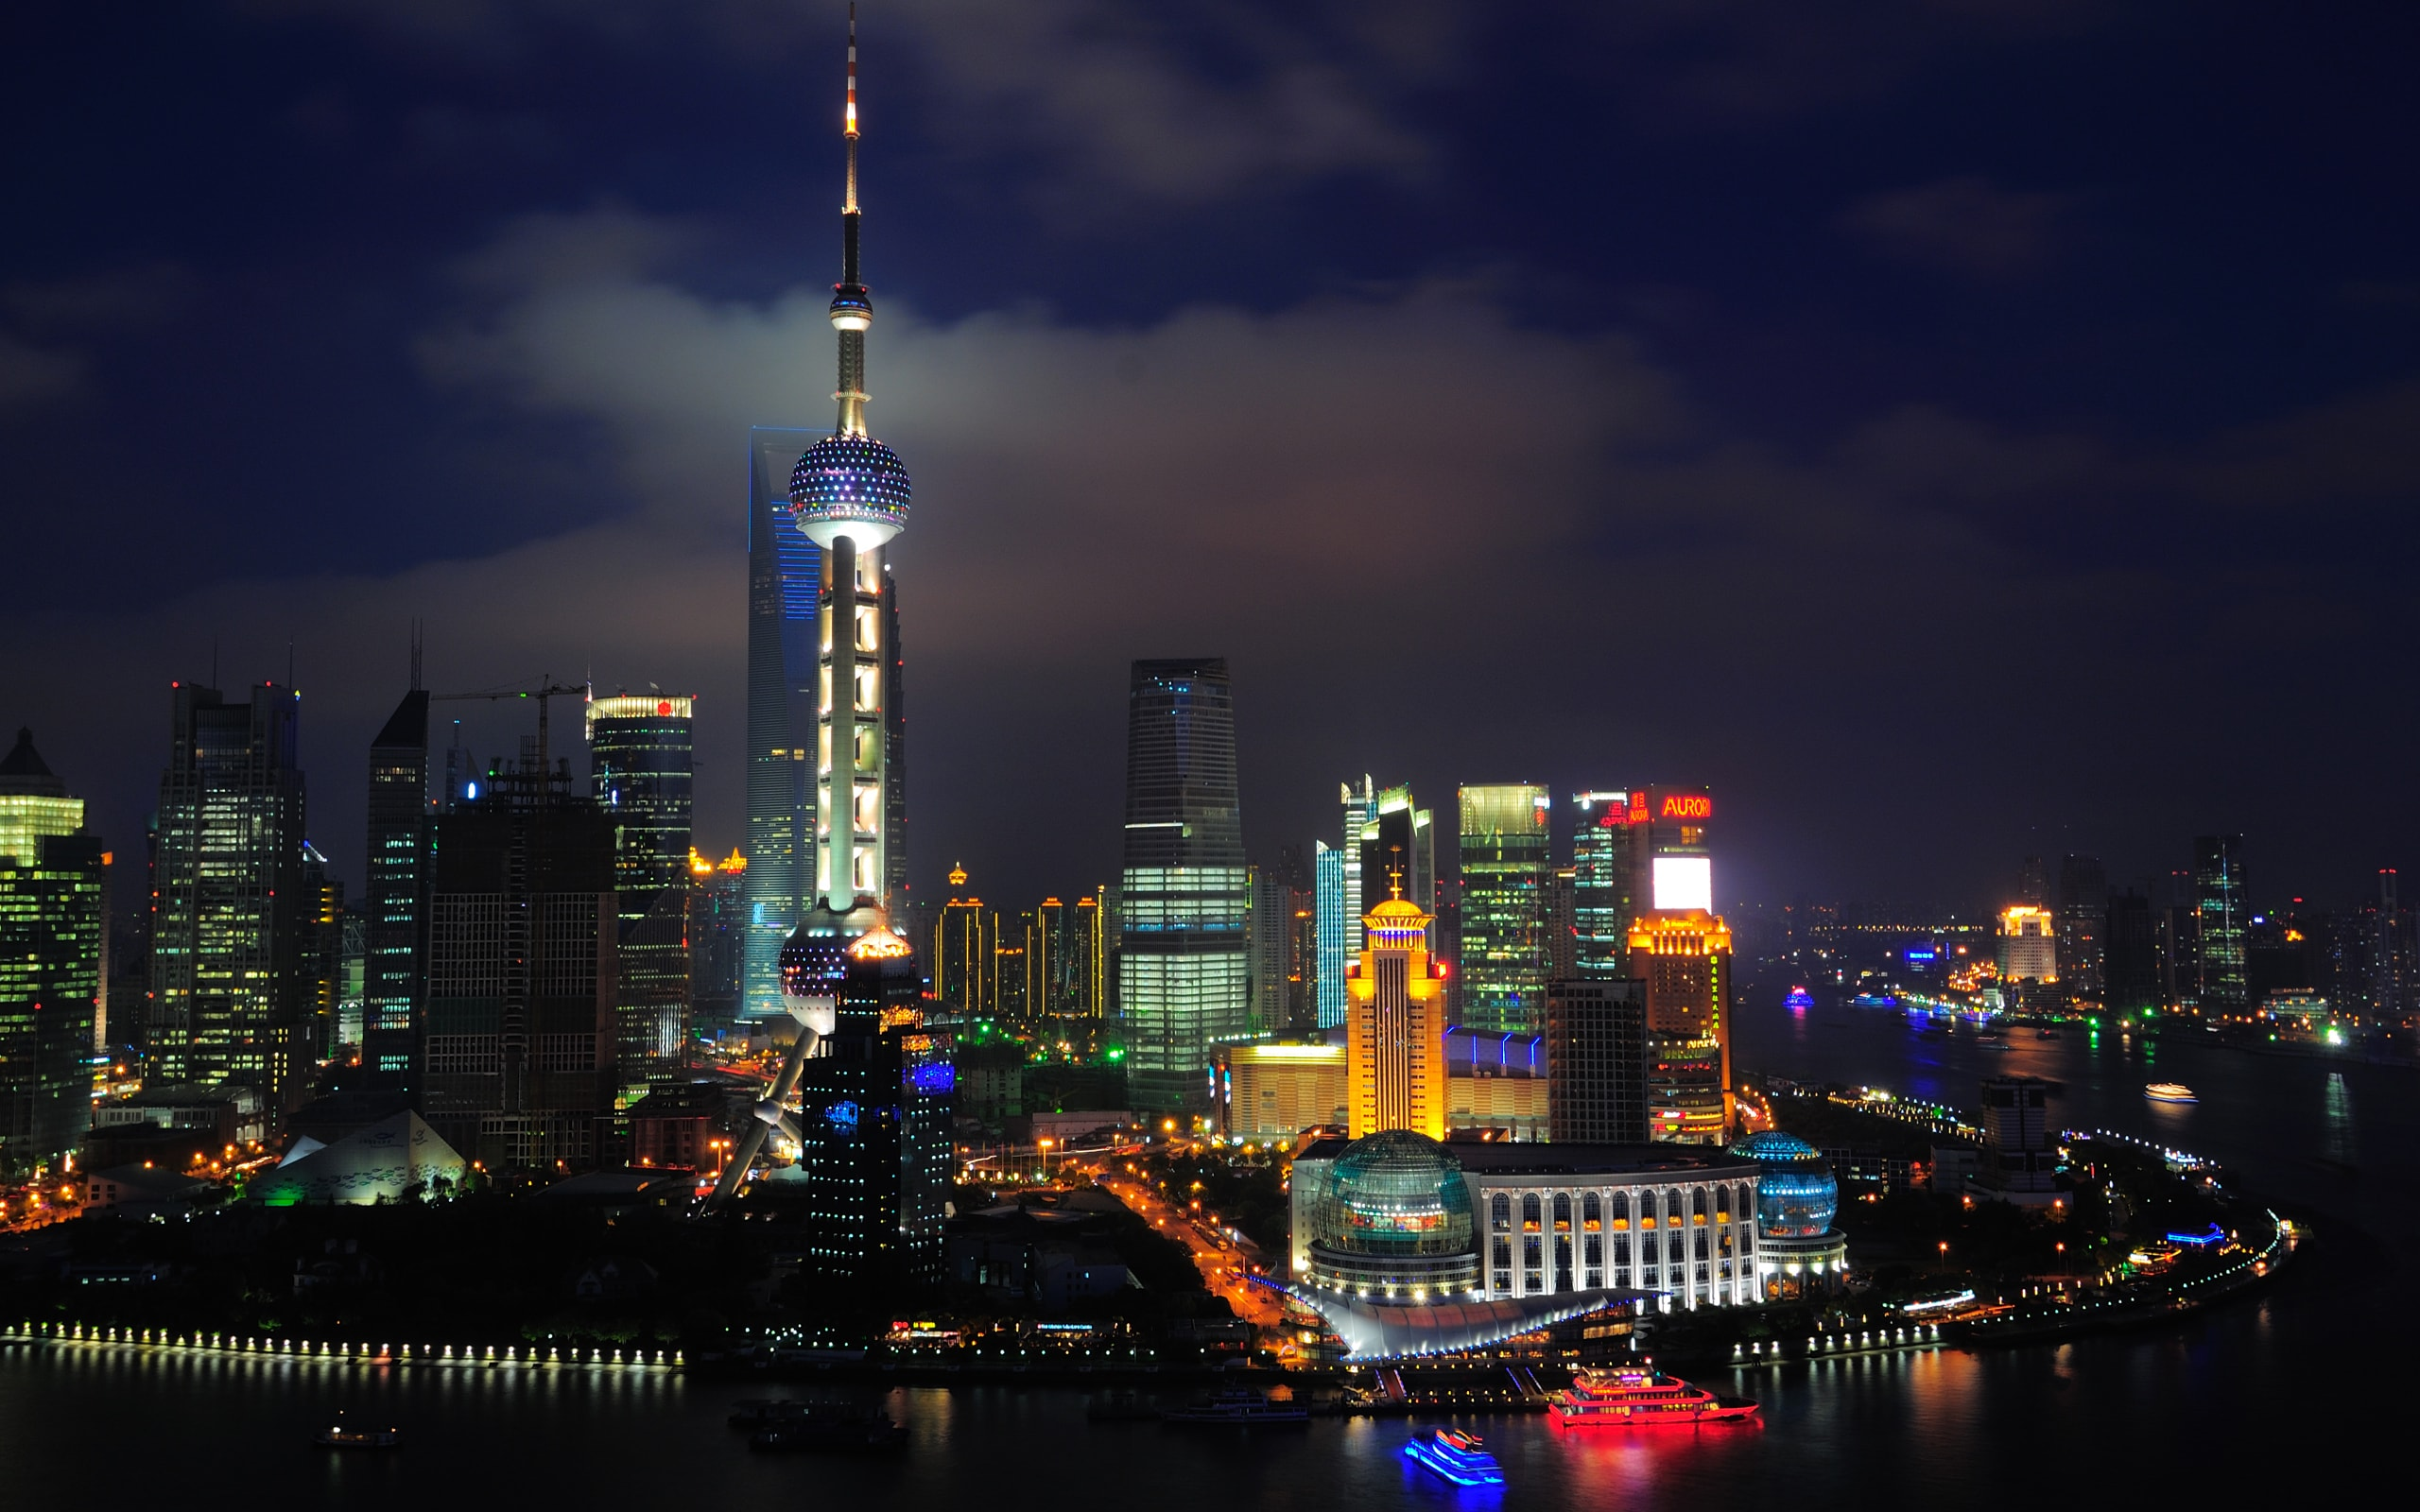 Shanghai widescreen for desktop